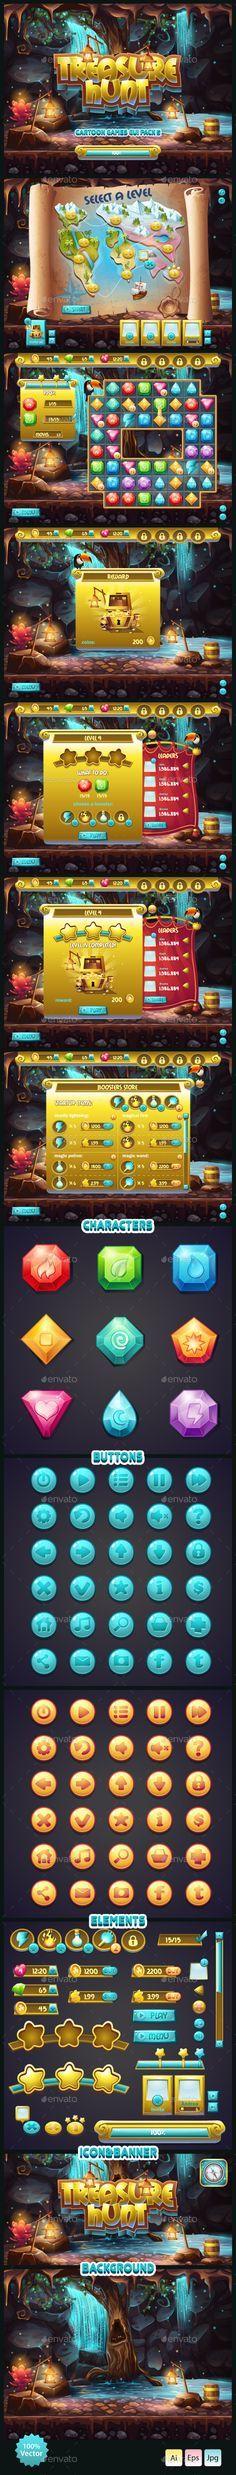 GUI Treasure Hunt - User Interfaces #Game #Assets   Download http://graphicriver.net/item/gui-treasure-hunt/10638211?ref=sinzo